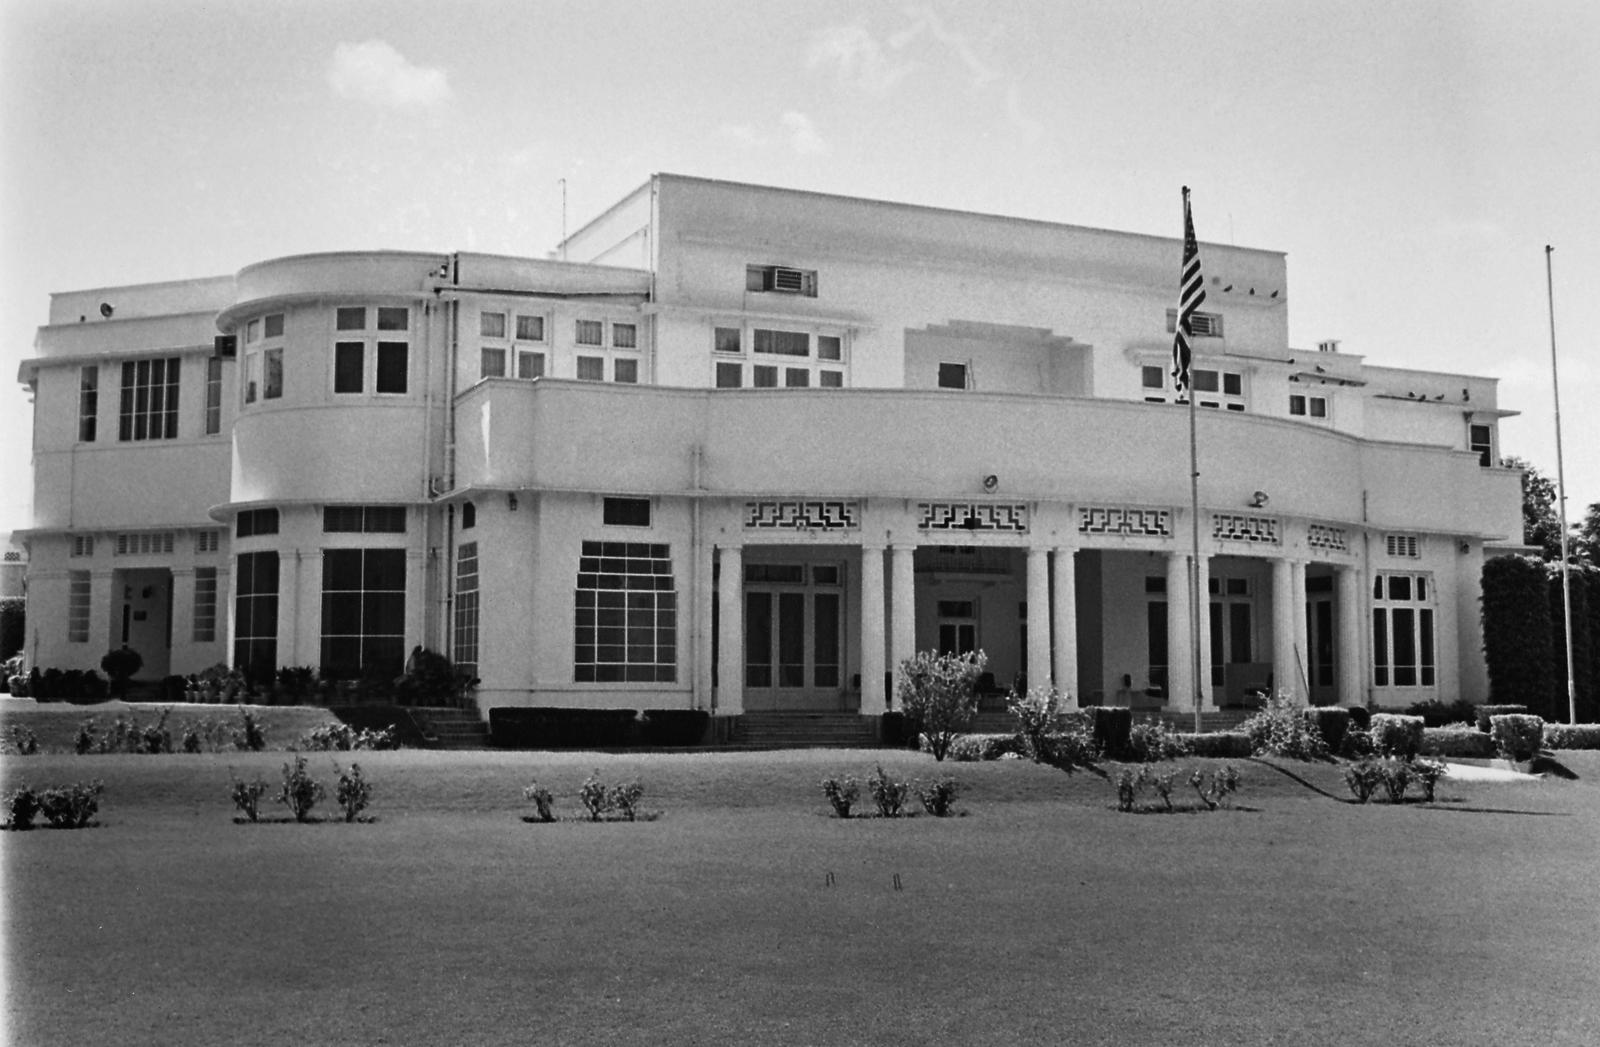 Lahore - Functional Building Site - 1972